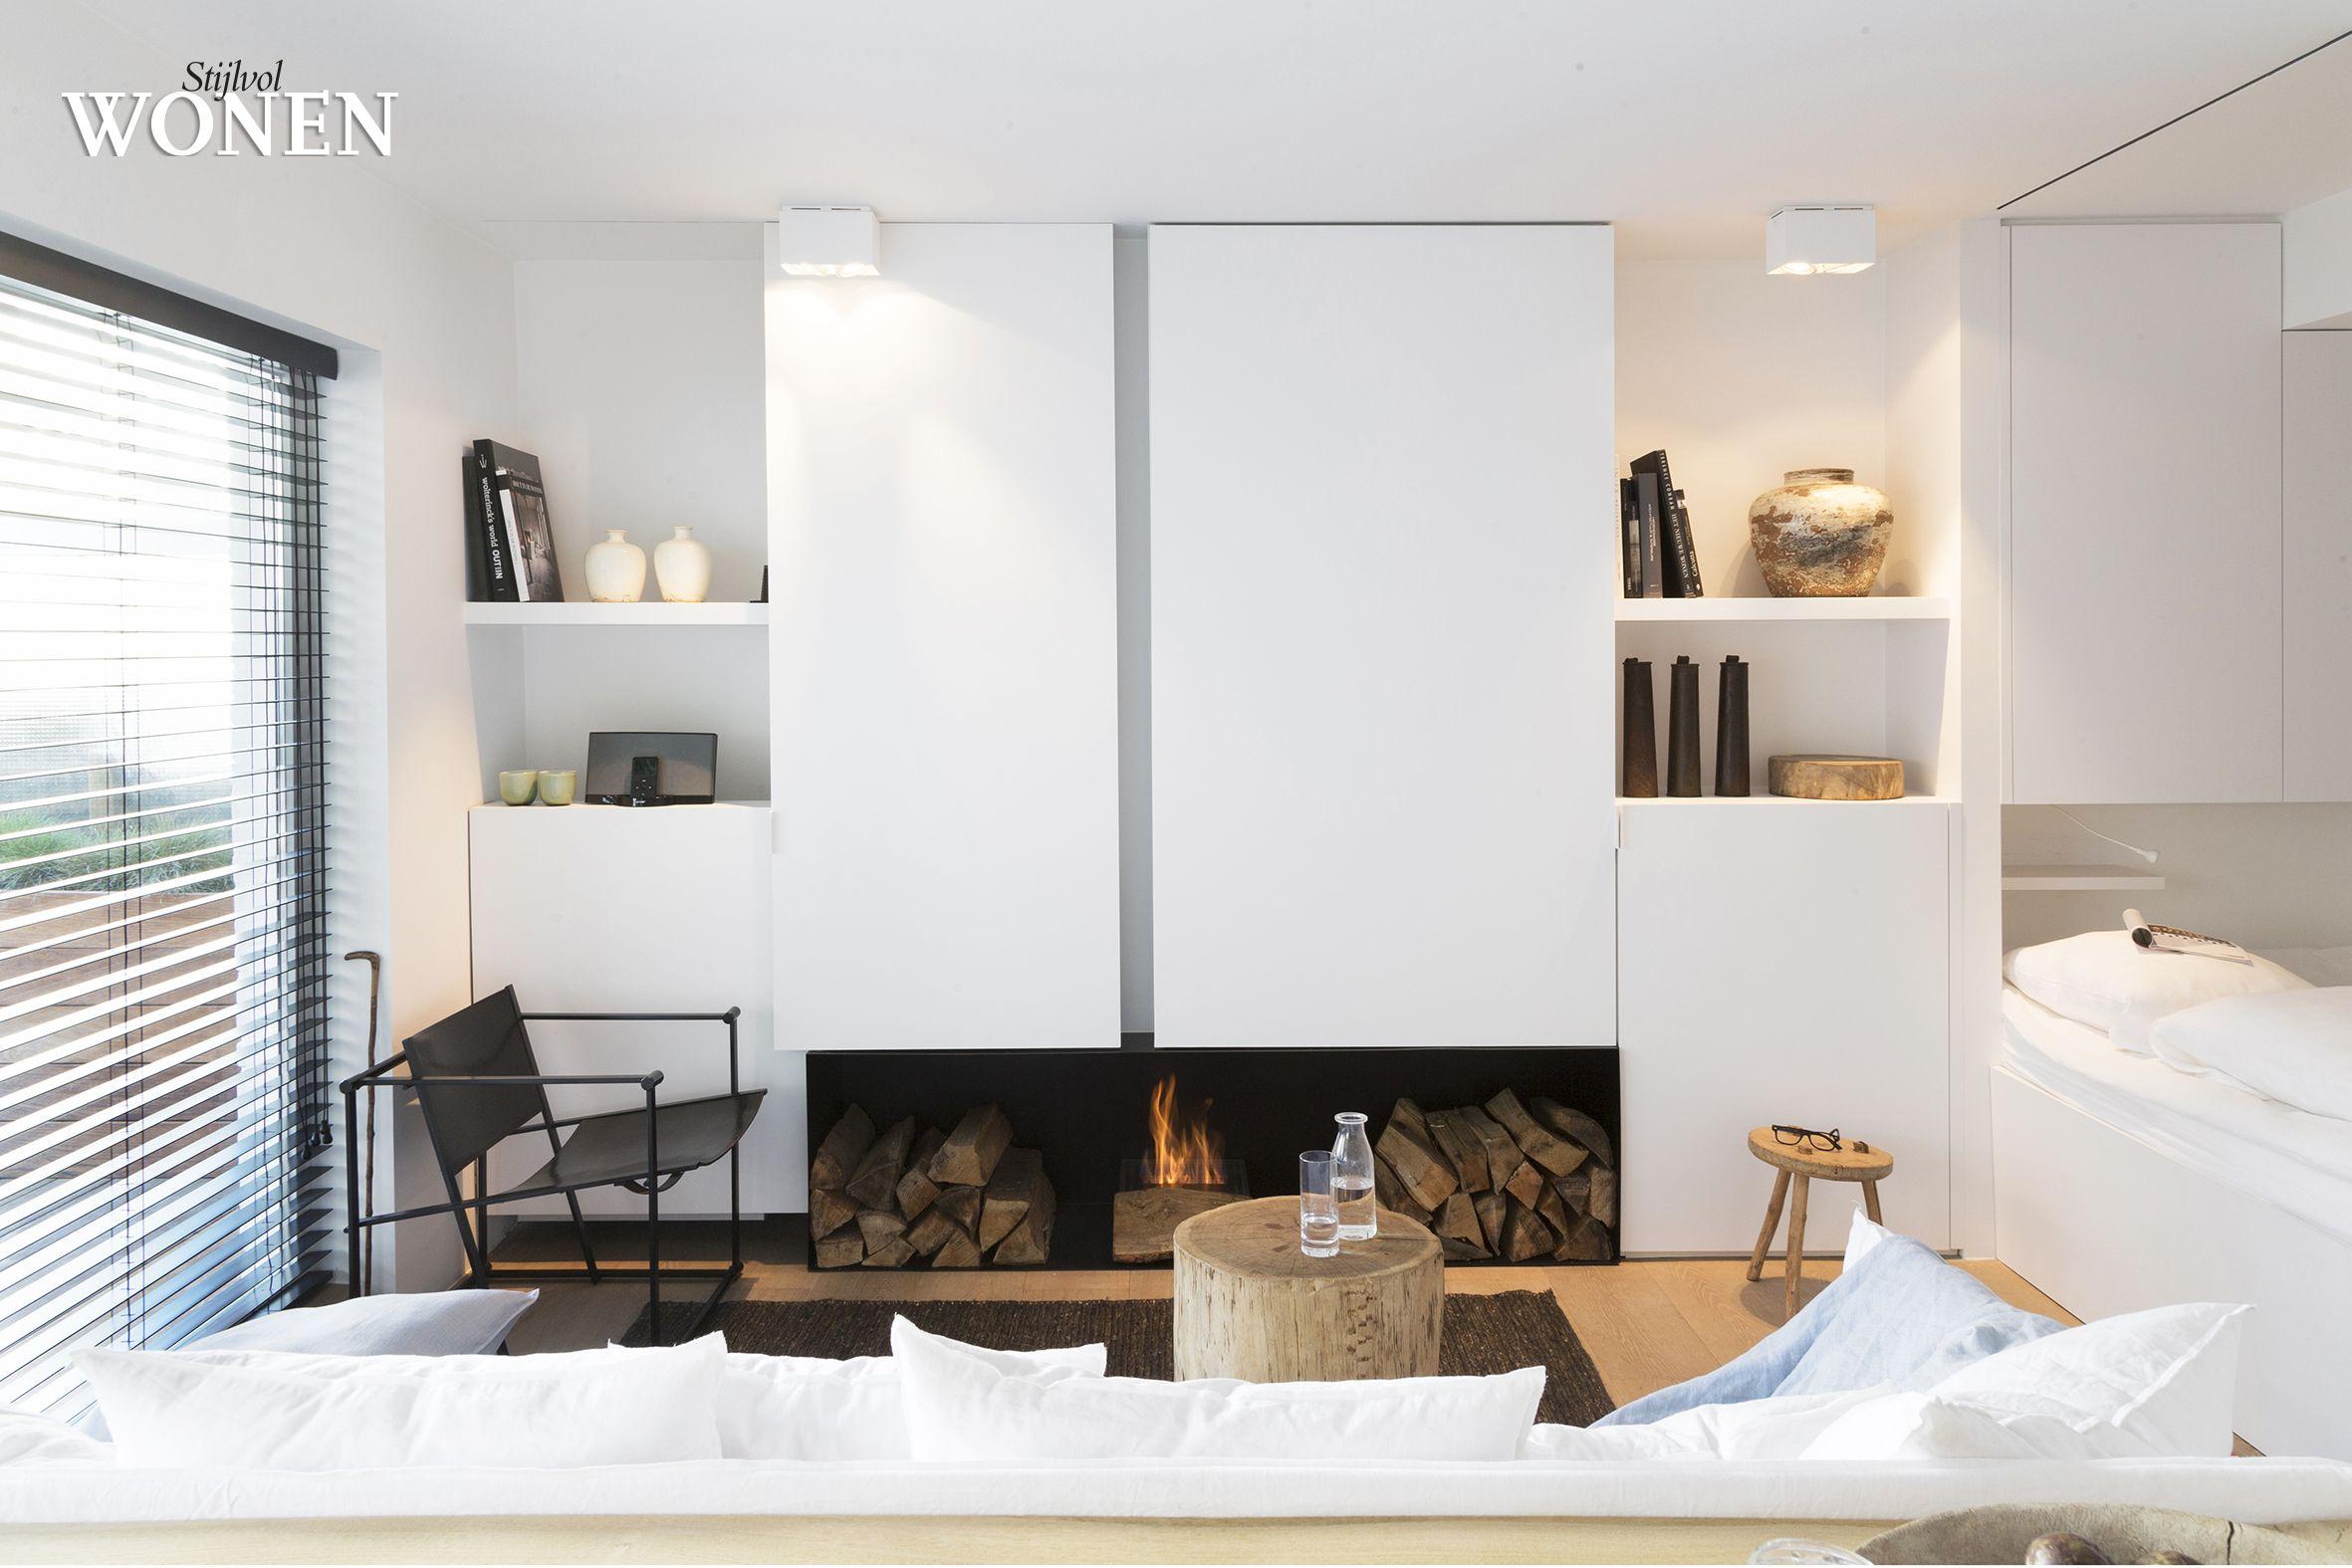 Stijlvol wonen interieur enzo architectuur and interieur